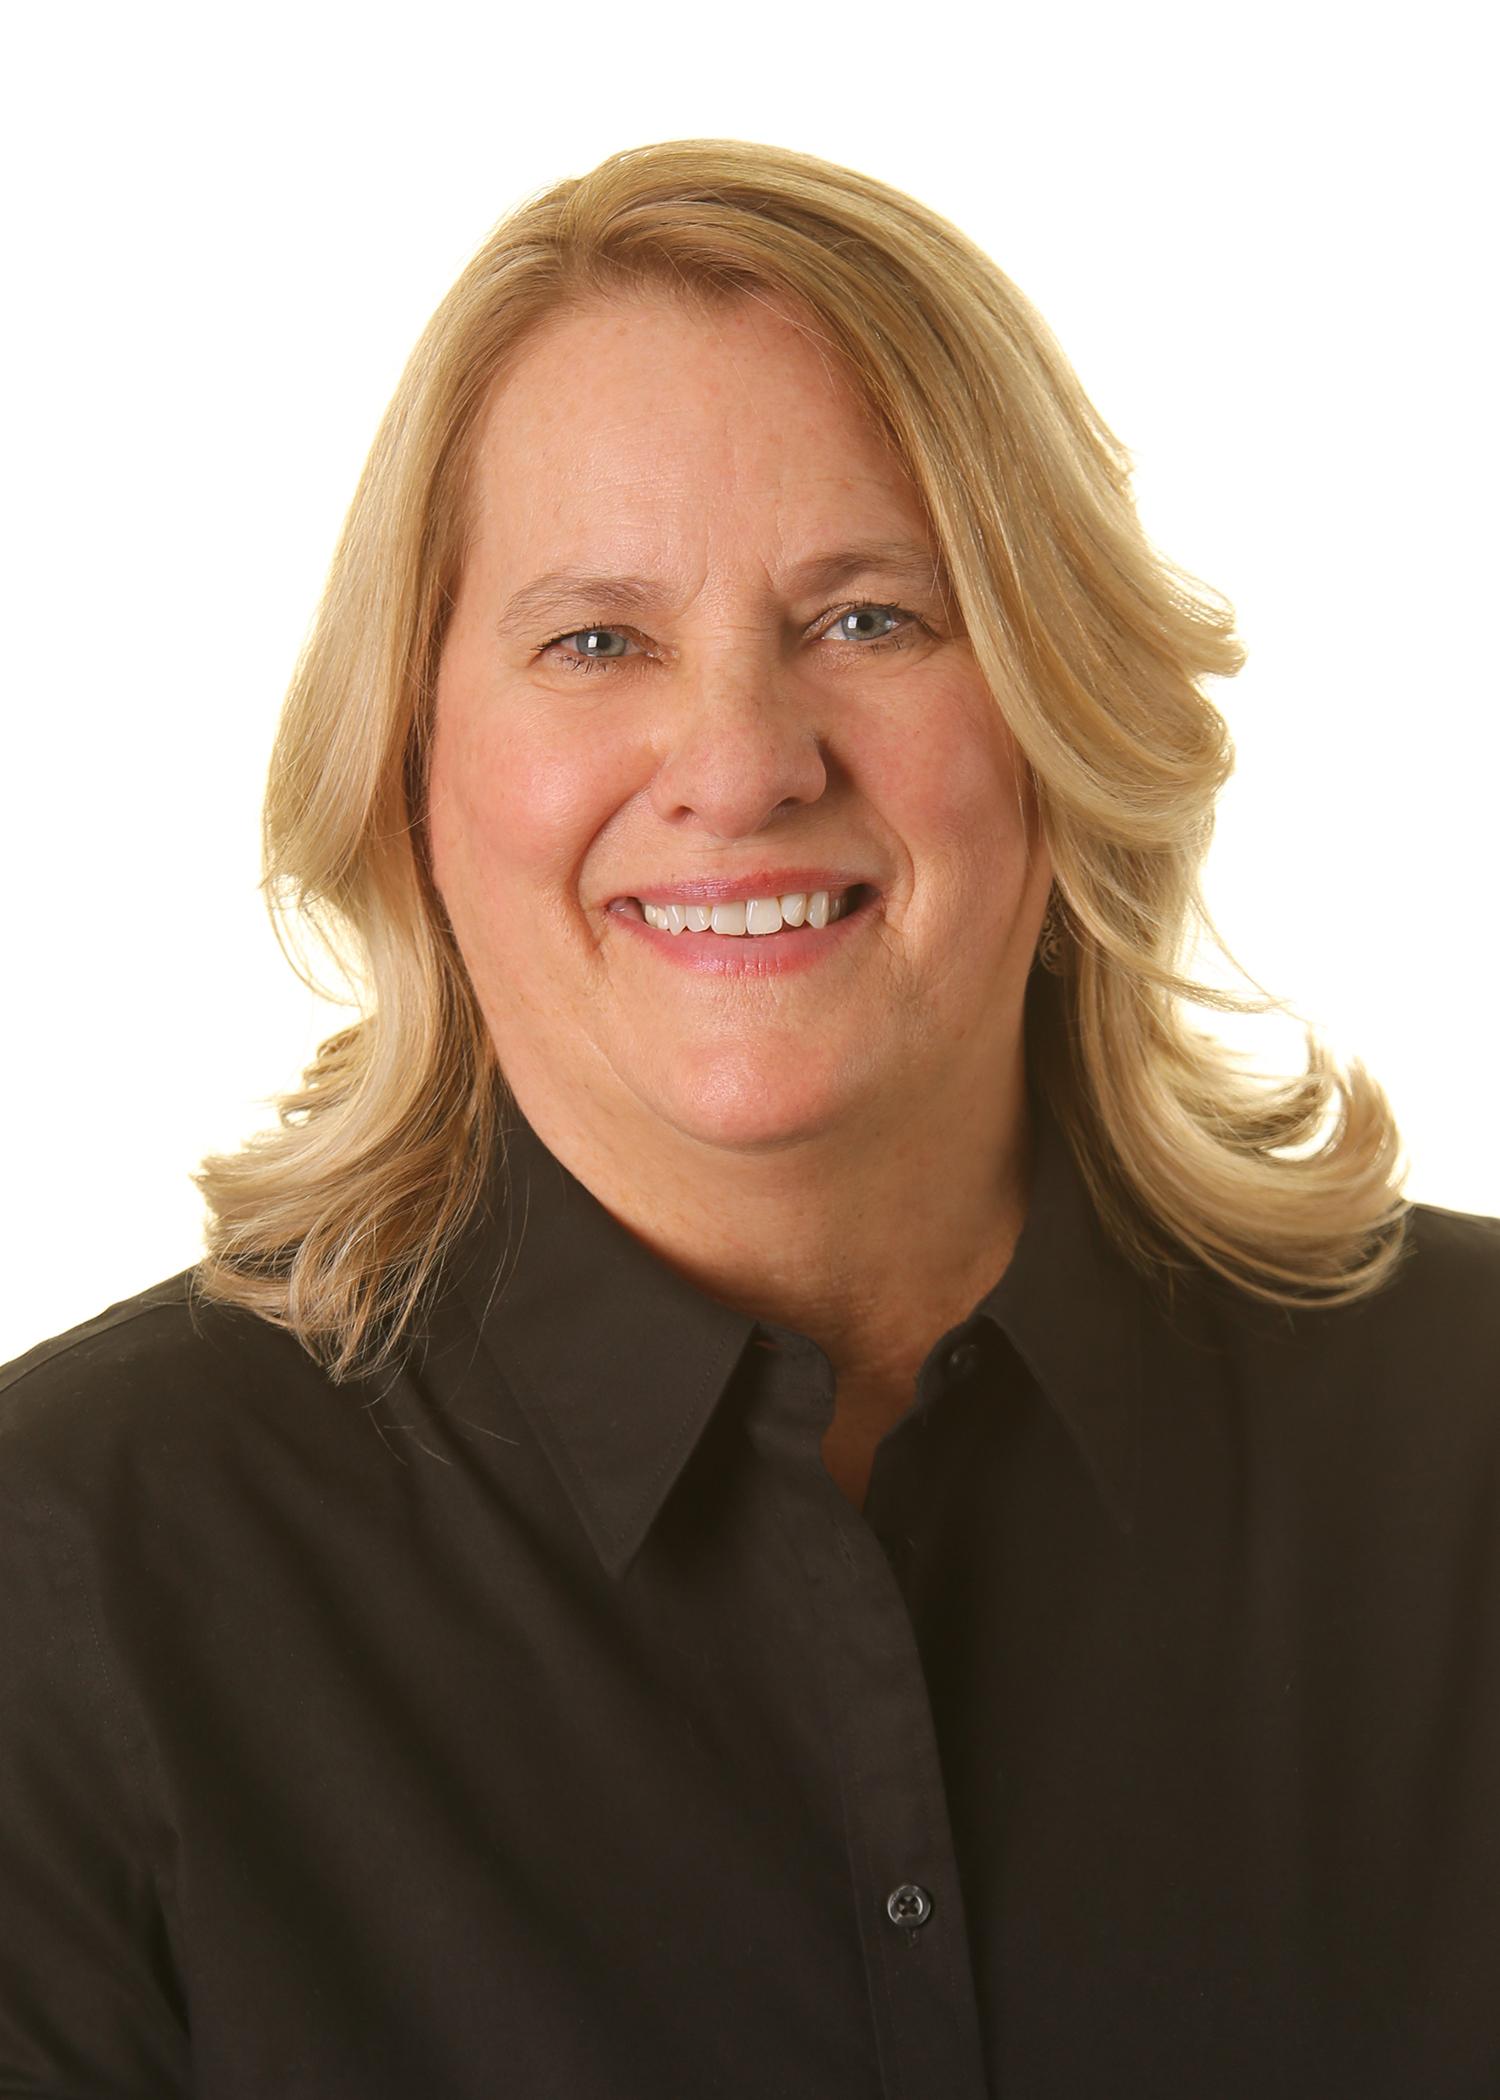 Carole Severson